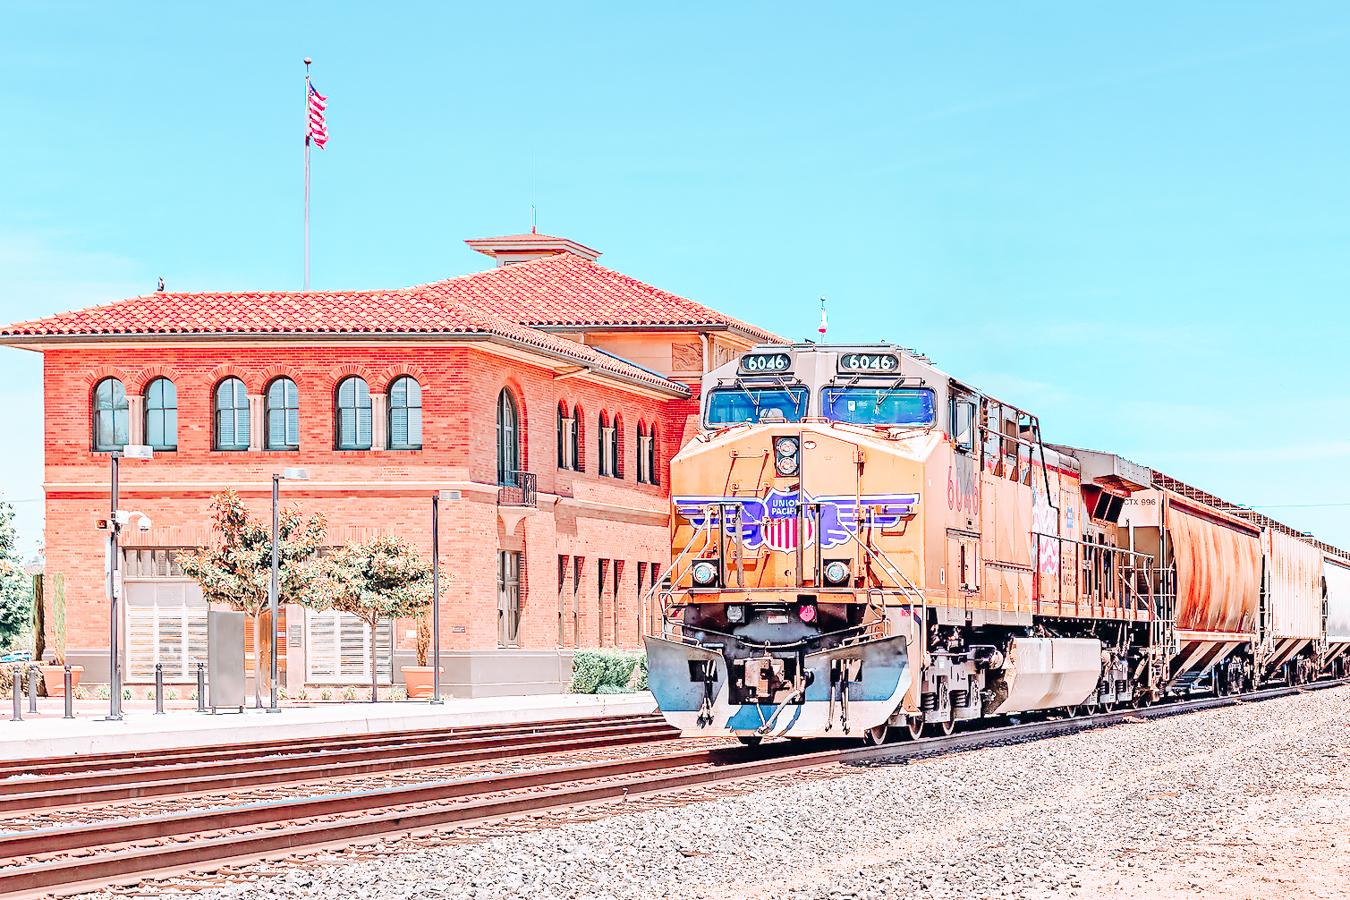 Train station and train